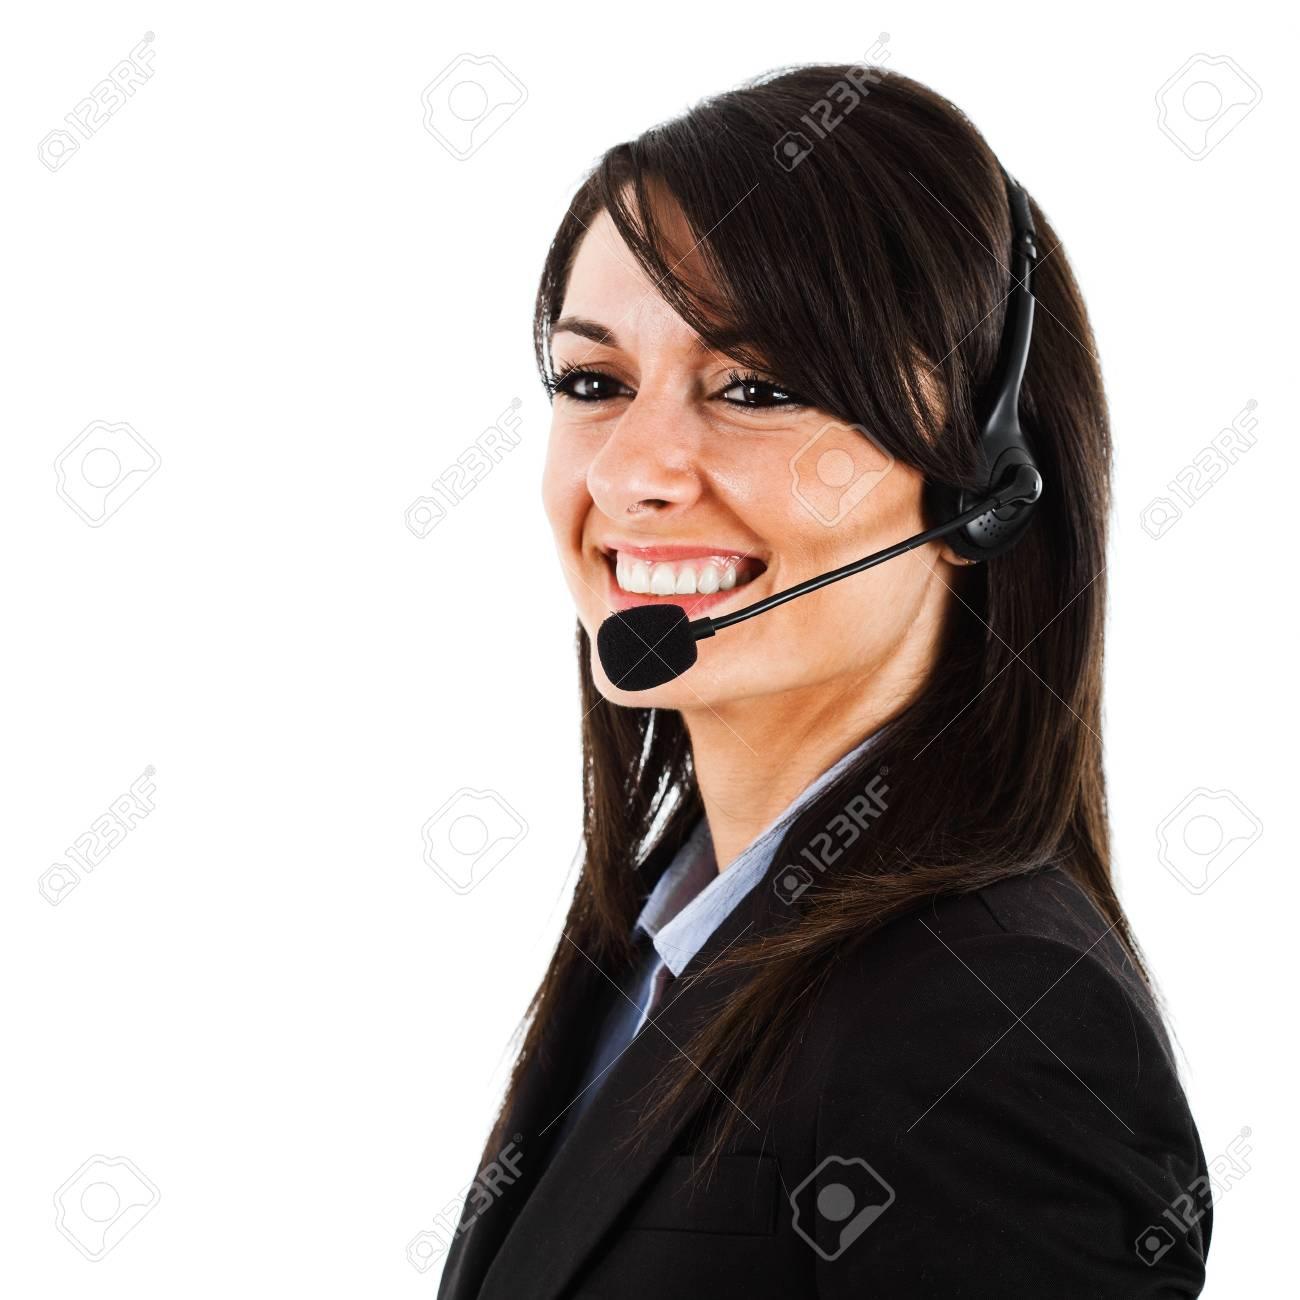 Portrait of a beautiful customer representative isolated on white Stock Photo - 15444964